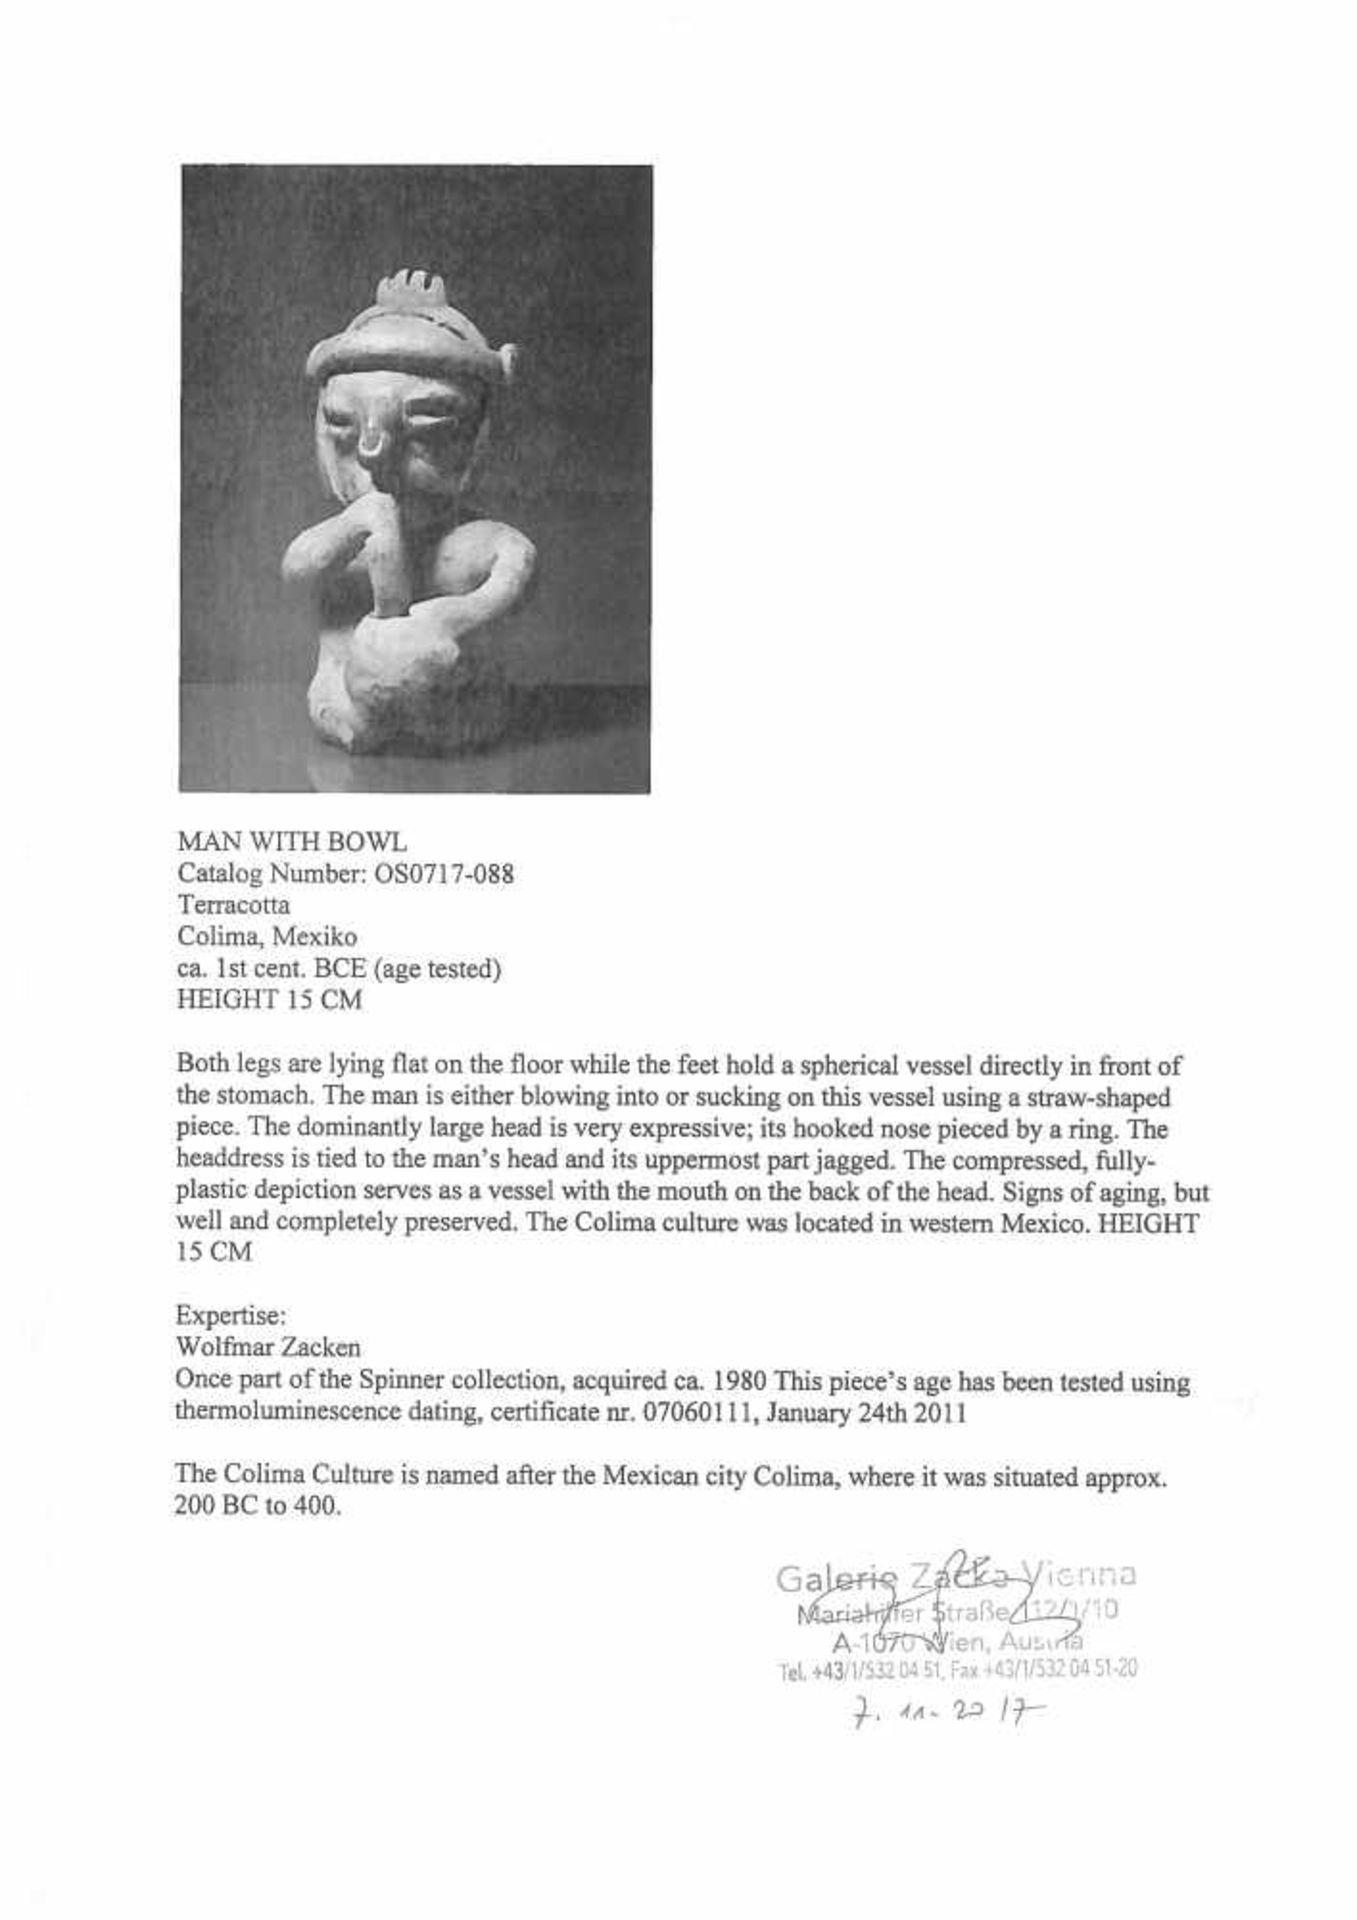 Ceramic figurine depicting a man smoking, Colima culture, Mexico, approx. 2,000 years old, 1st centu - Bild 5 aus 6